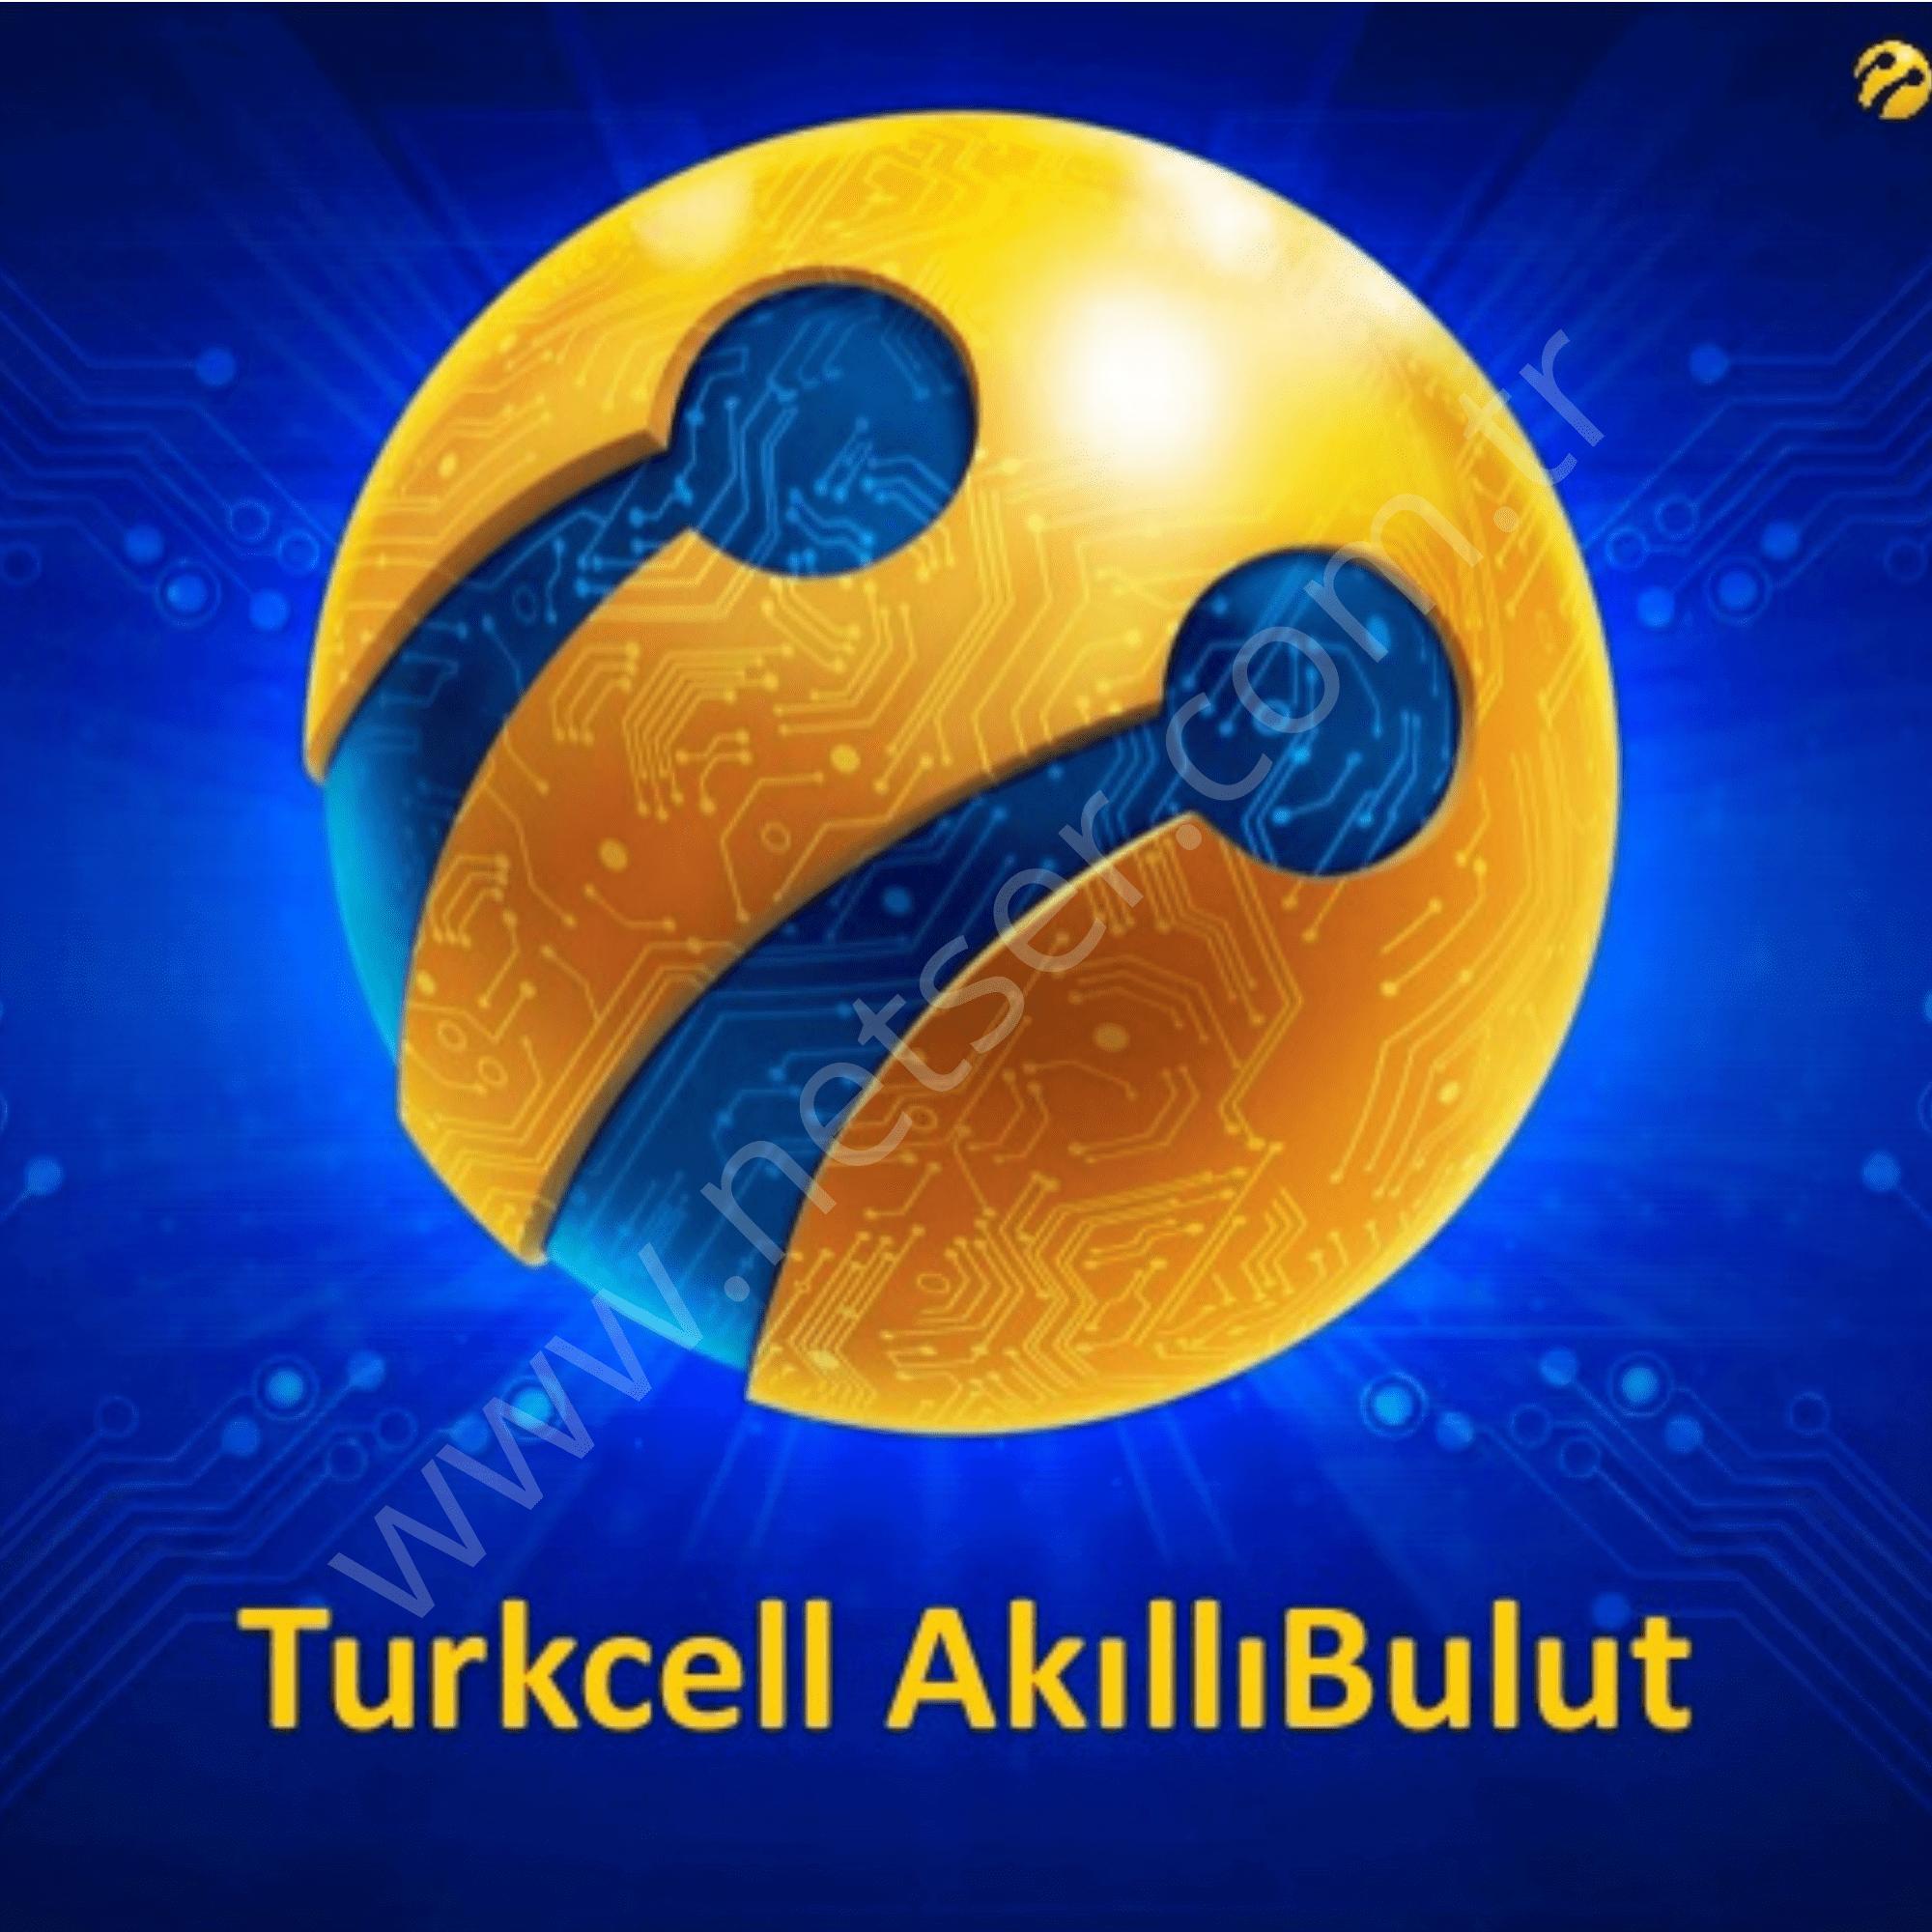 Turkcell Bulut